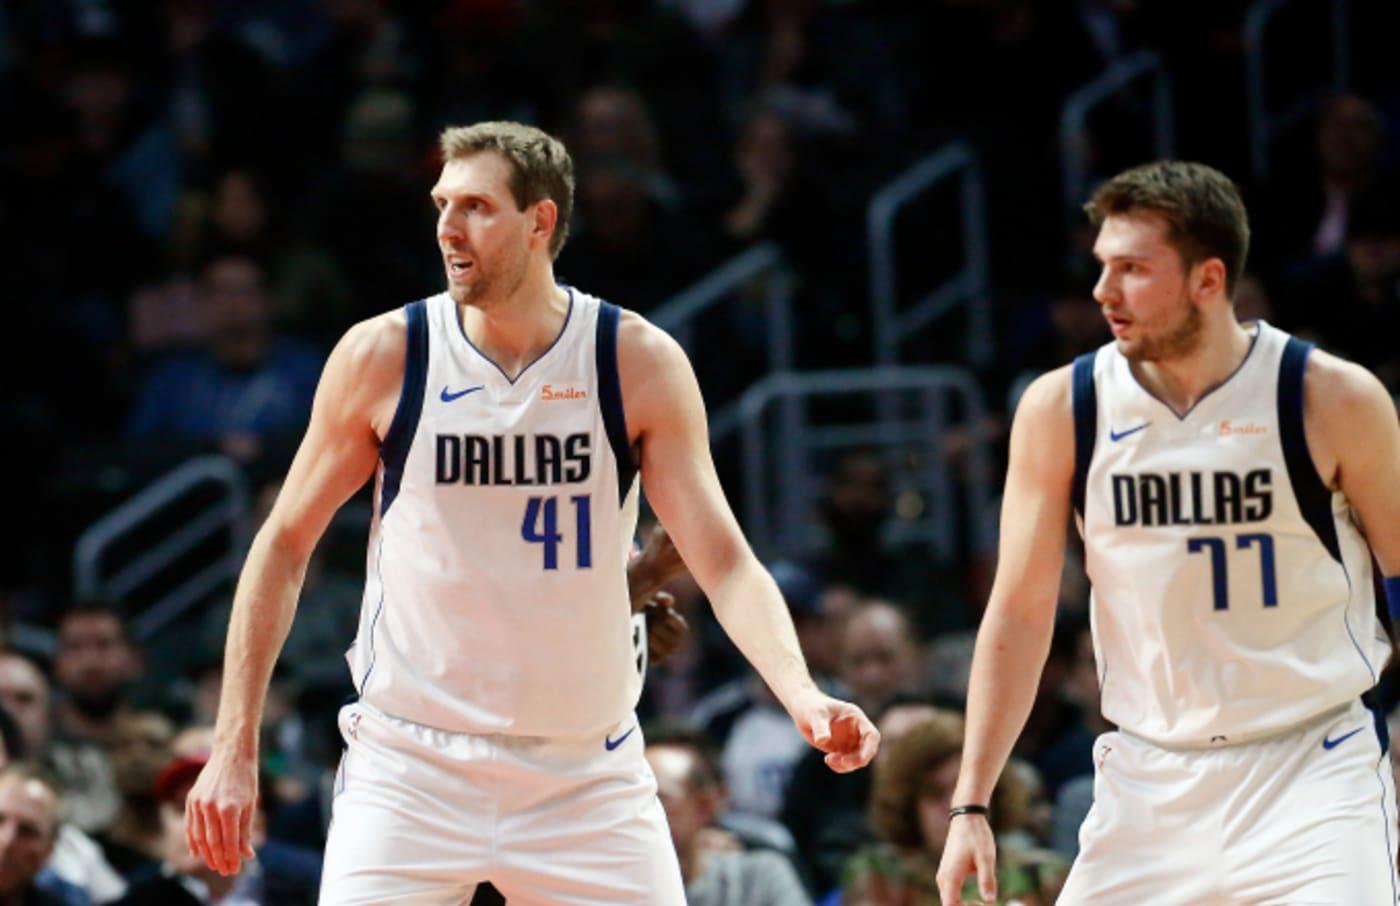 Dirk Nowitzki #41, and Luka Doncic #77 of the Dallas Mavericks